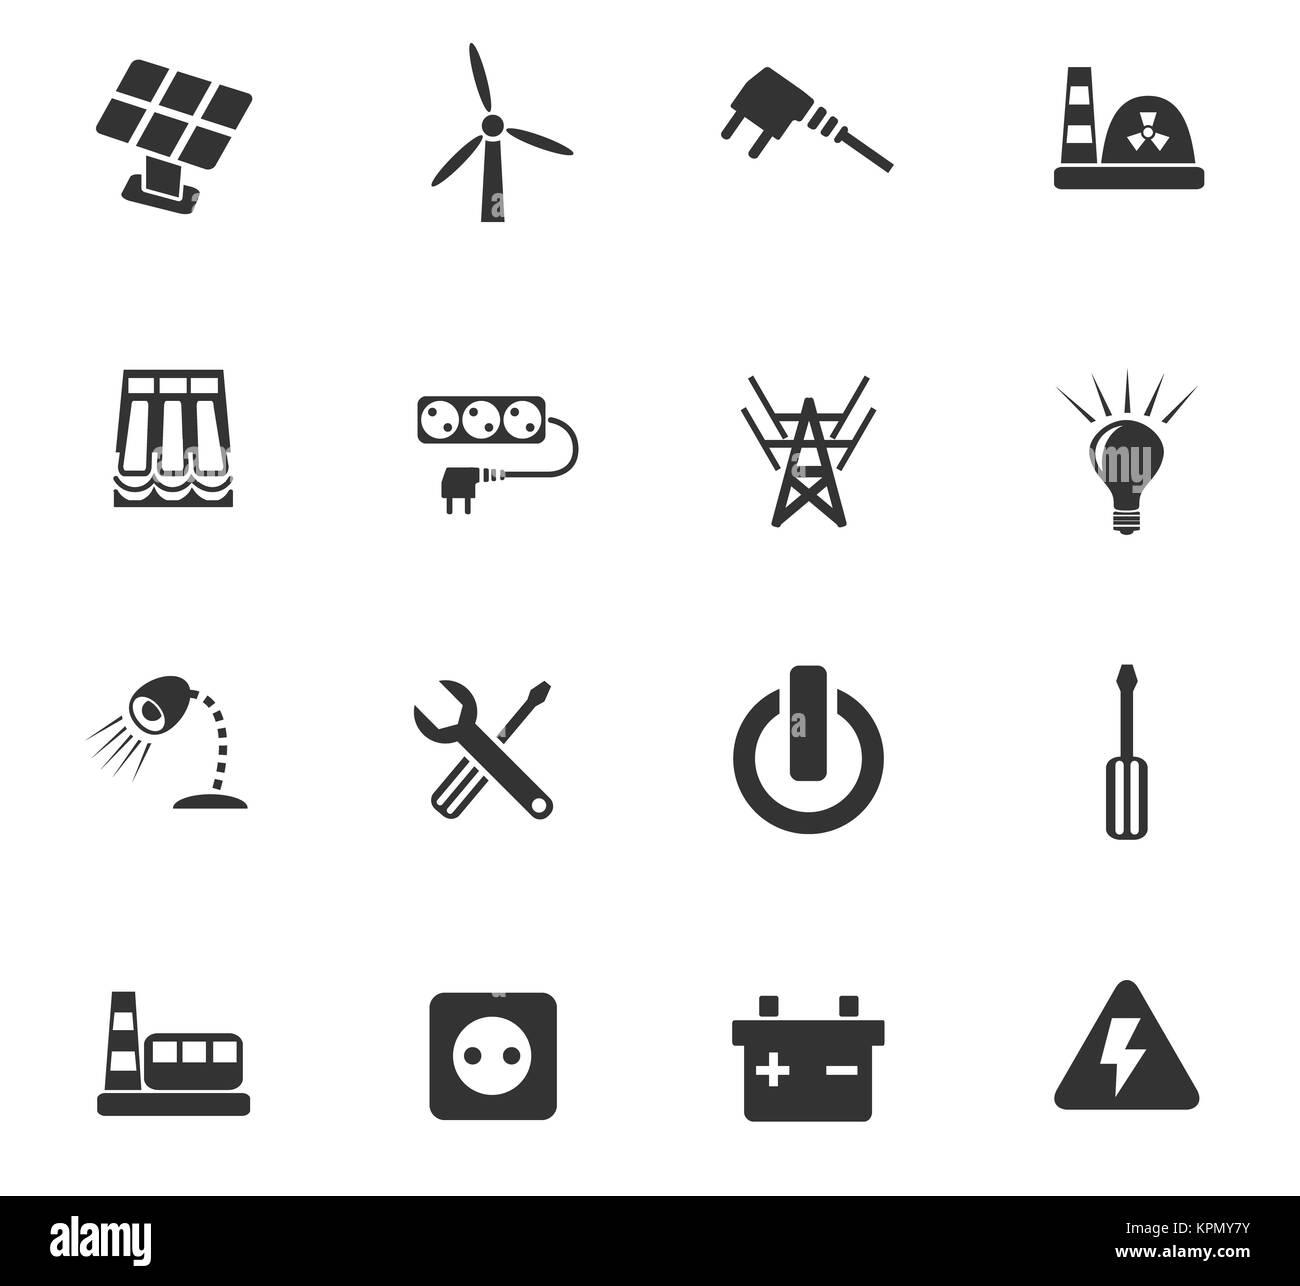 electricity icon set - Stock Image